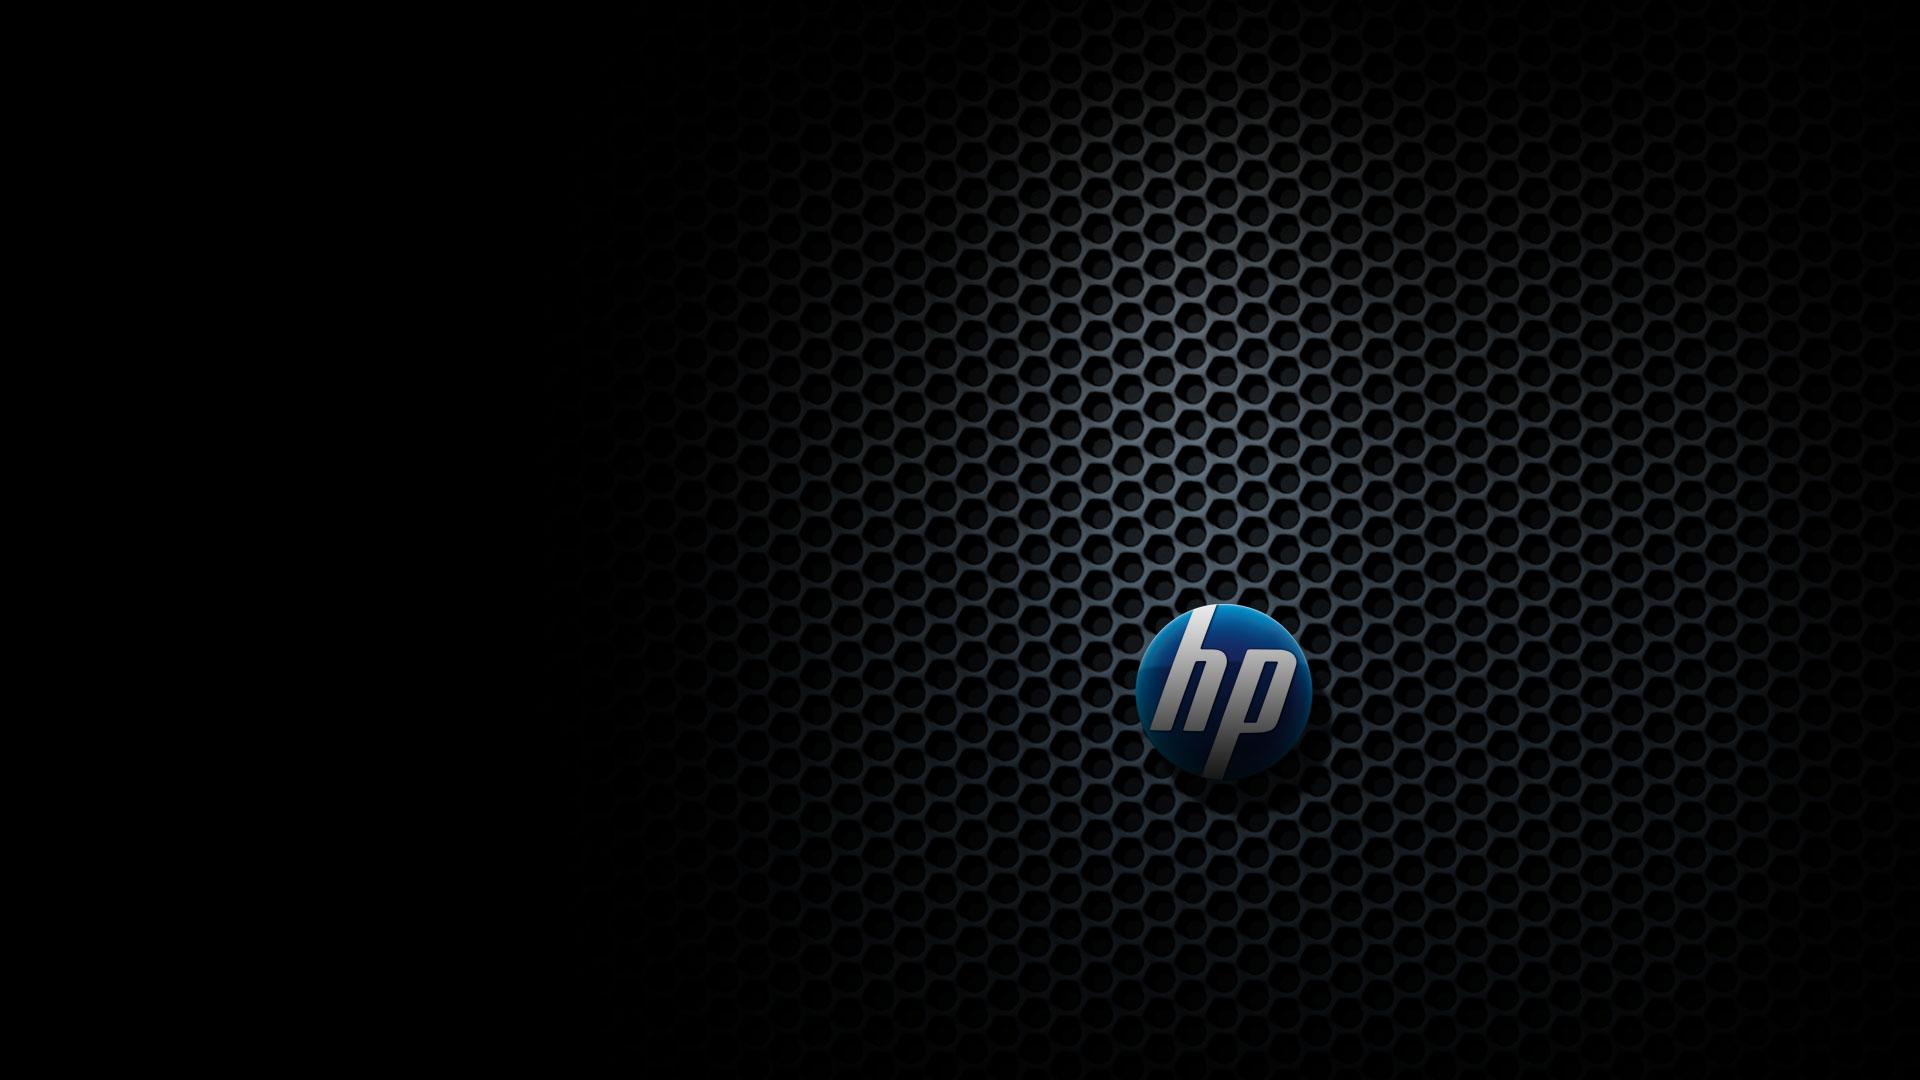 wallpapers hd 1080p Desktop Backgrounds for HD Wallpaper 1920x1080